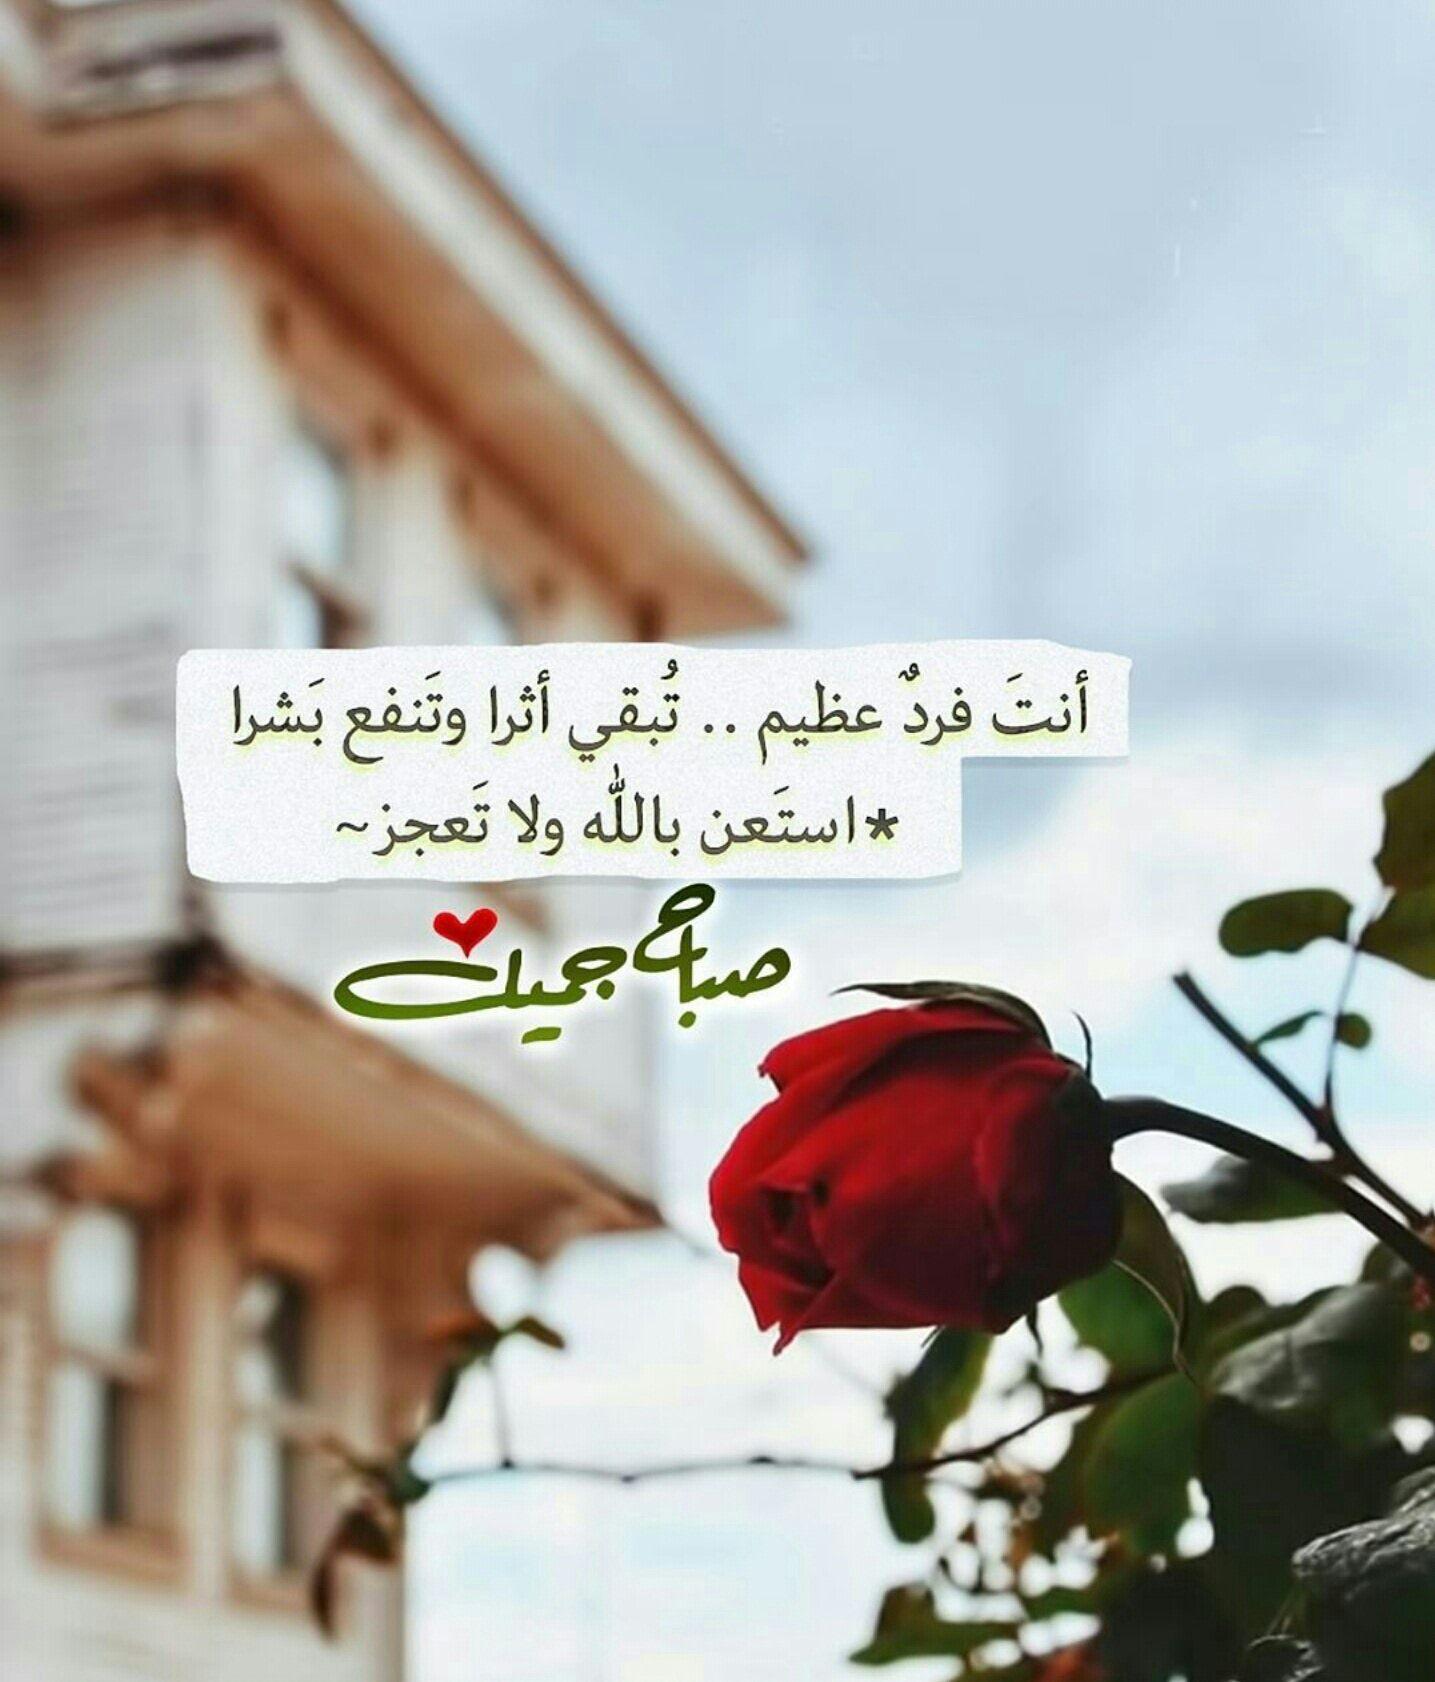 صباح الخير Good Morning Romantic Love Quotes Evening Pictures Morning Wish